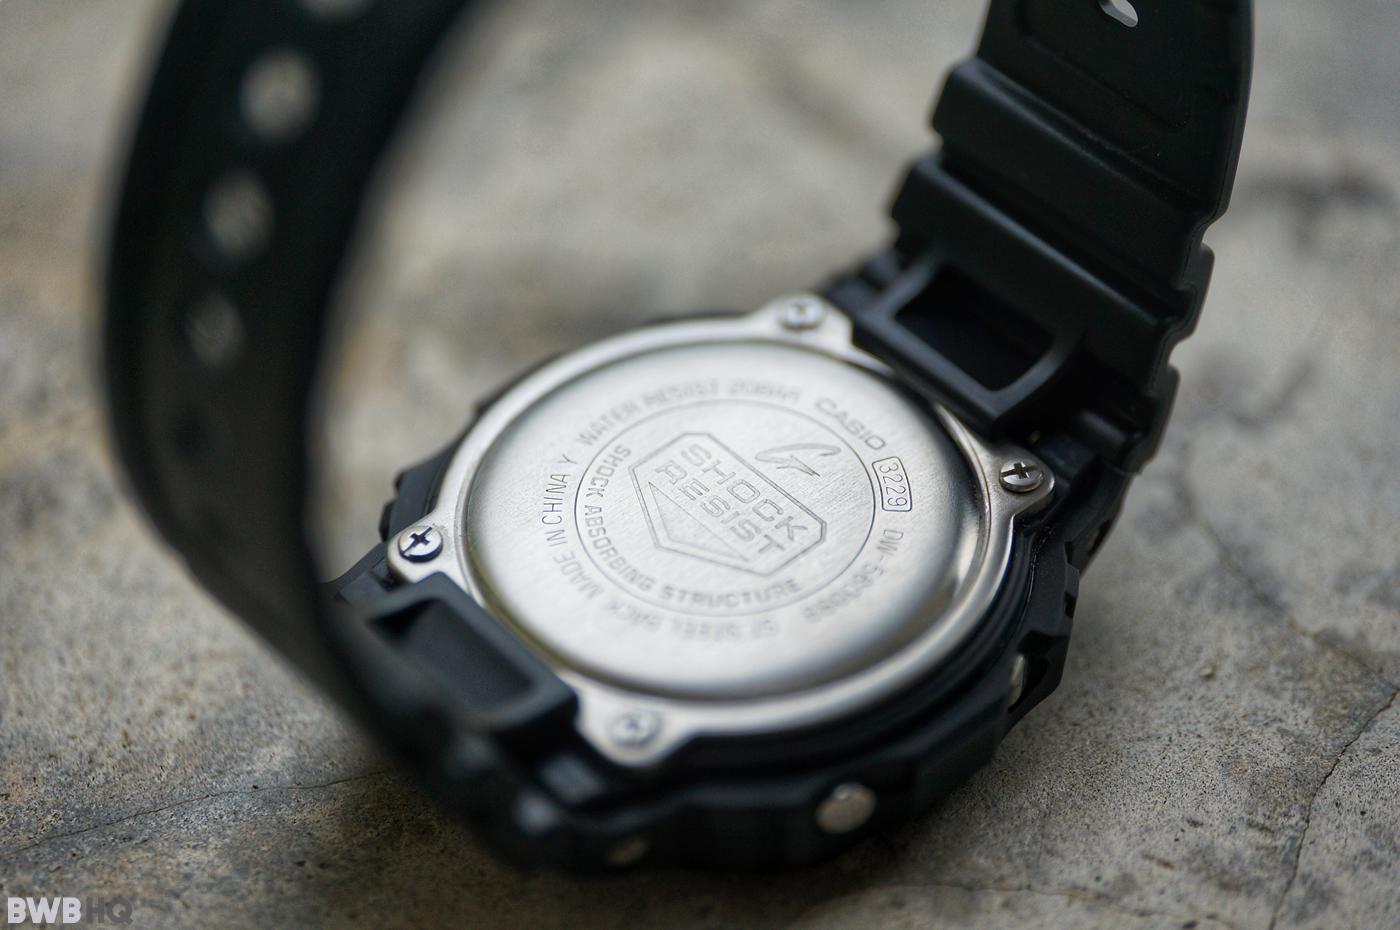 G-Shock DW5600BB All Black Stamped Caseback